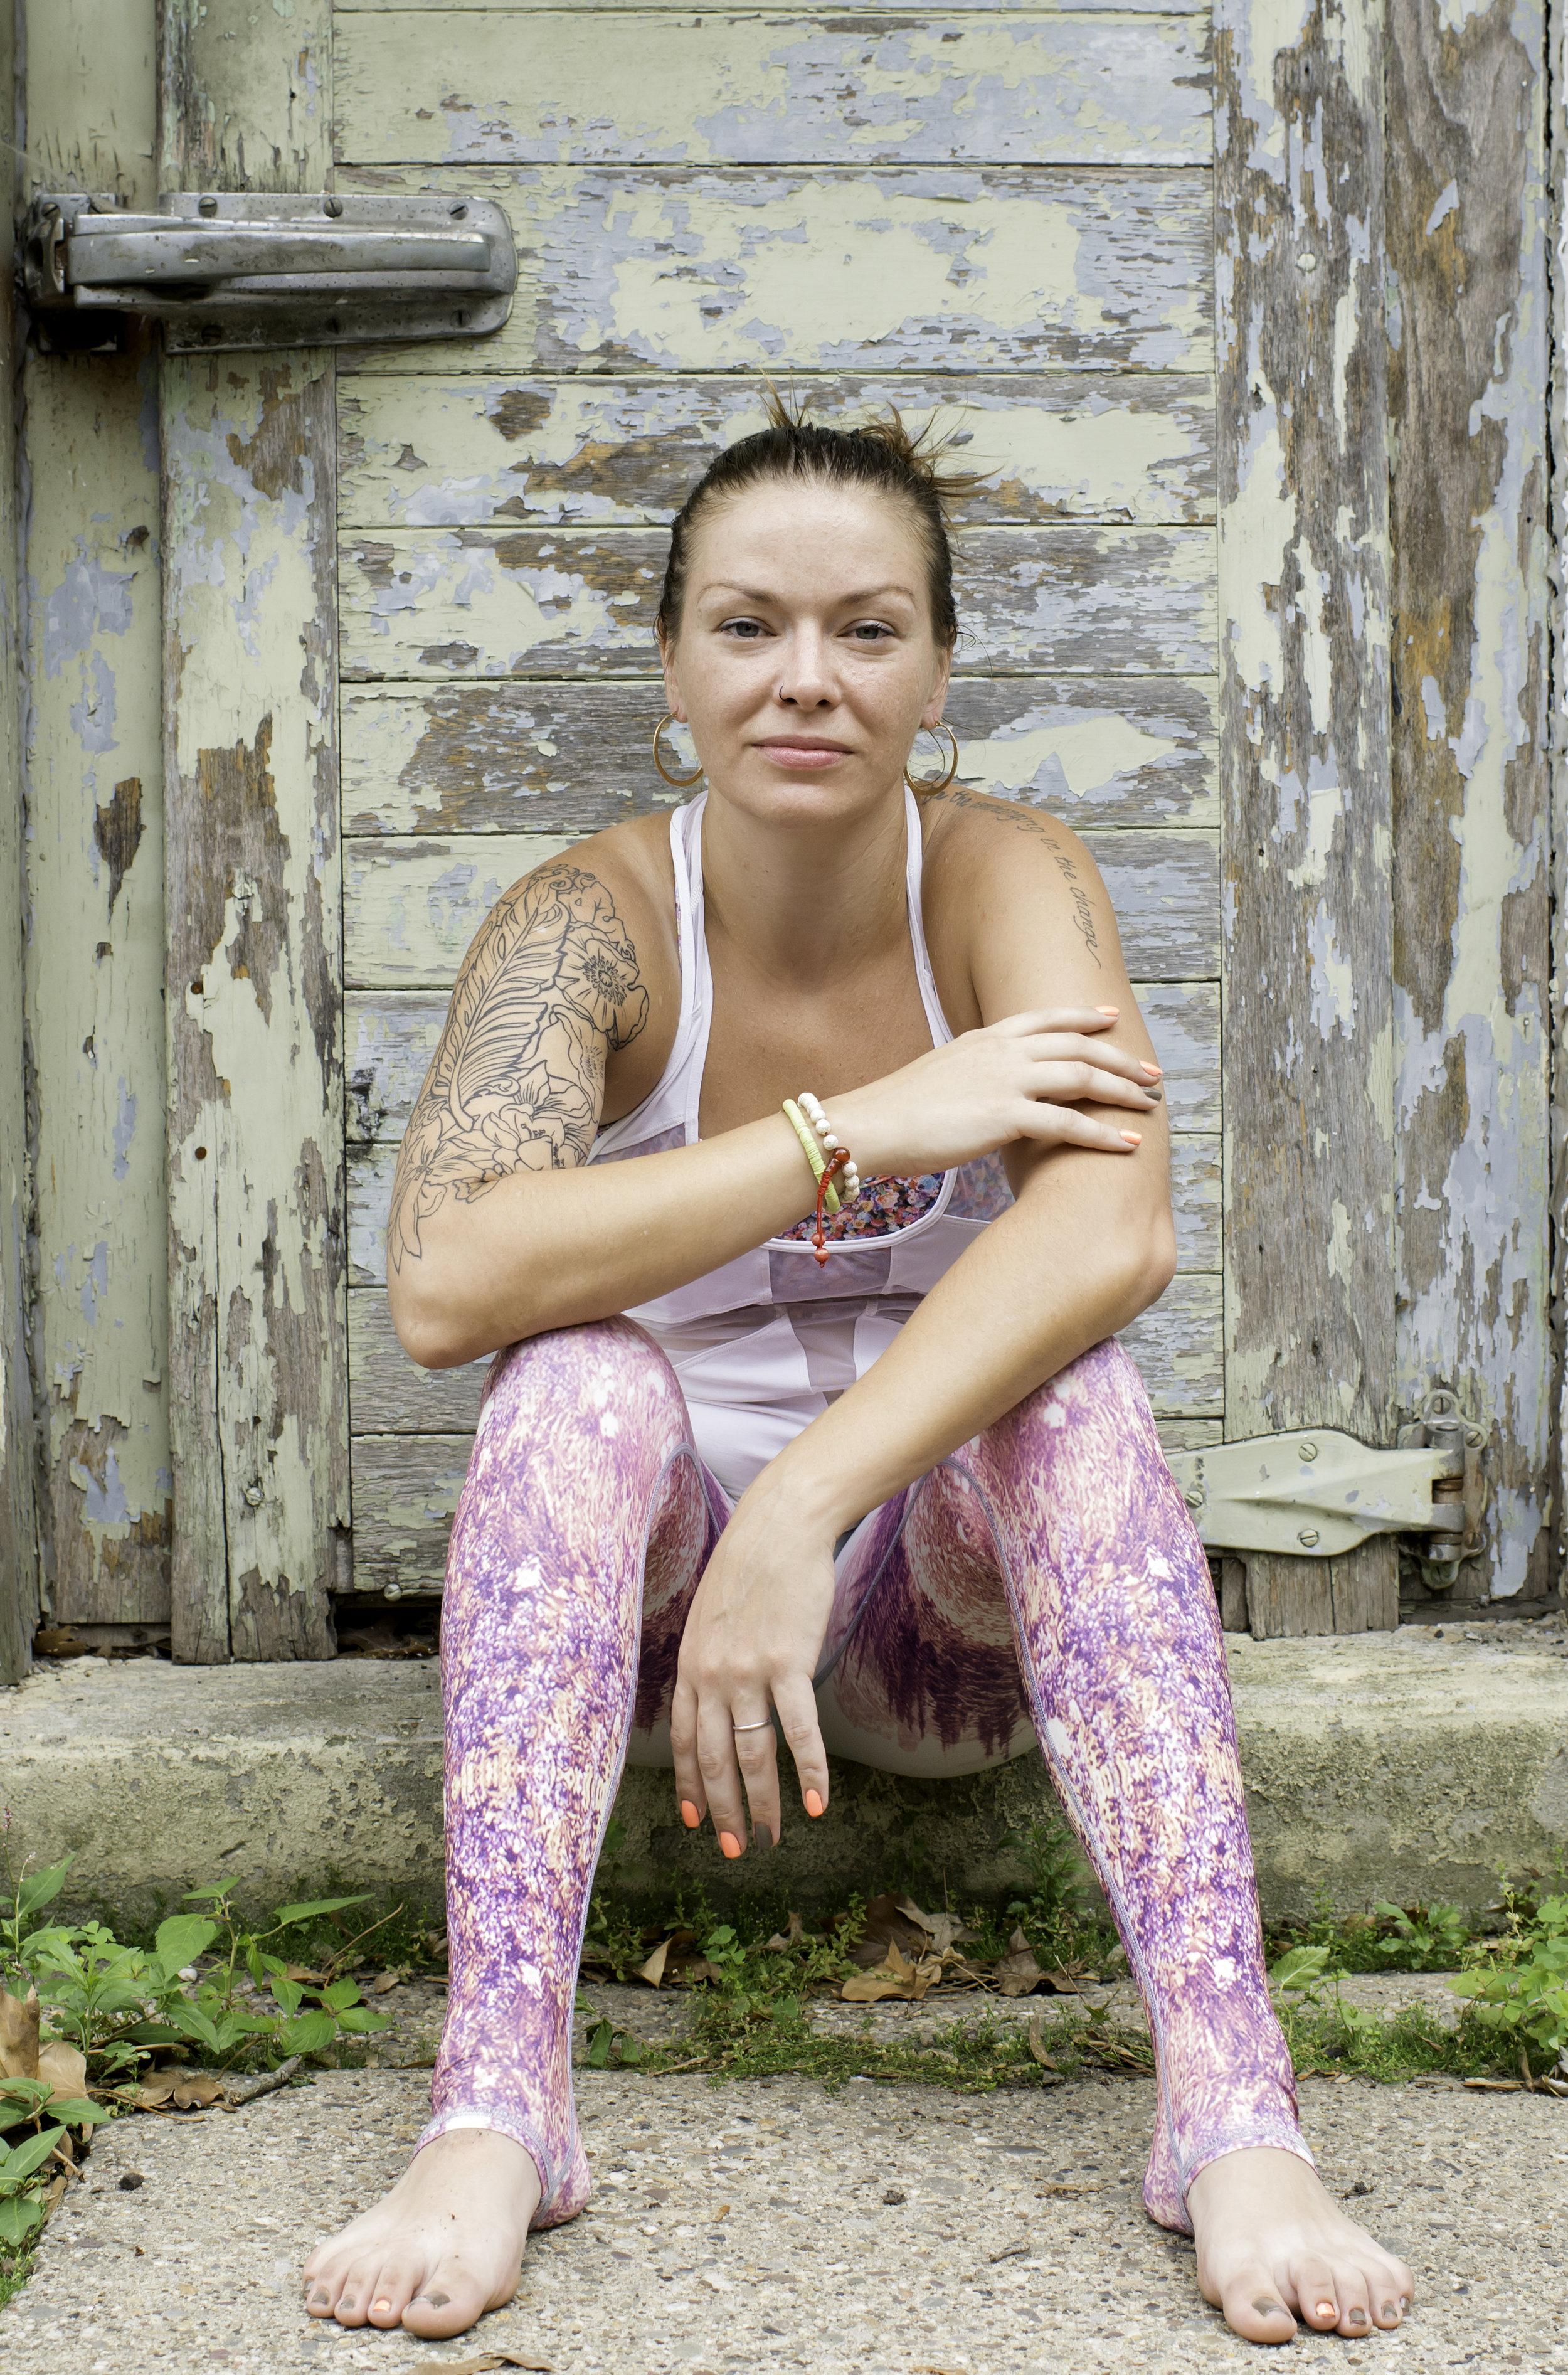 12:00pm - 1:00pm - Budokon with Sarah Kasserman, SHINE Power Yoga